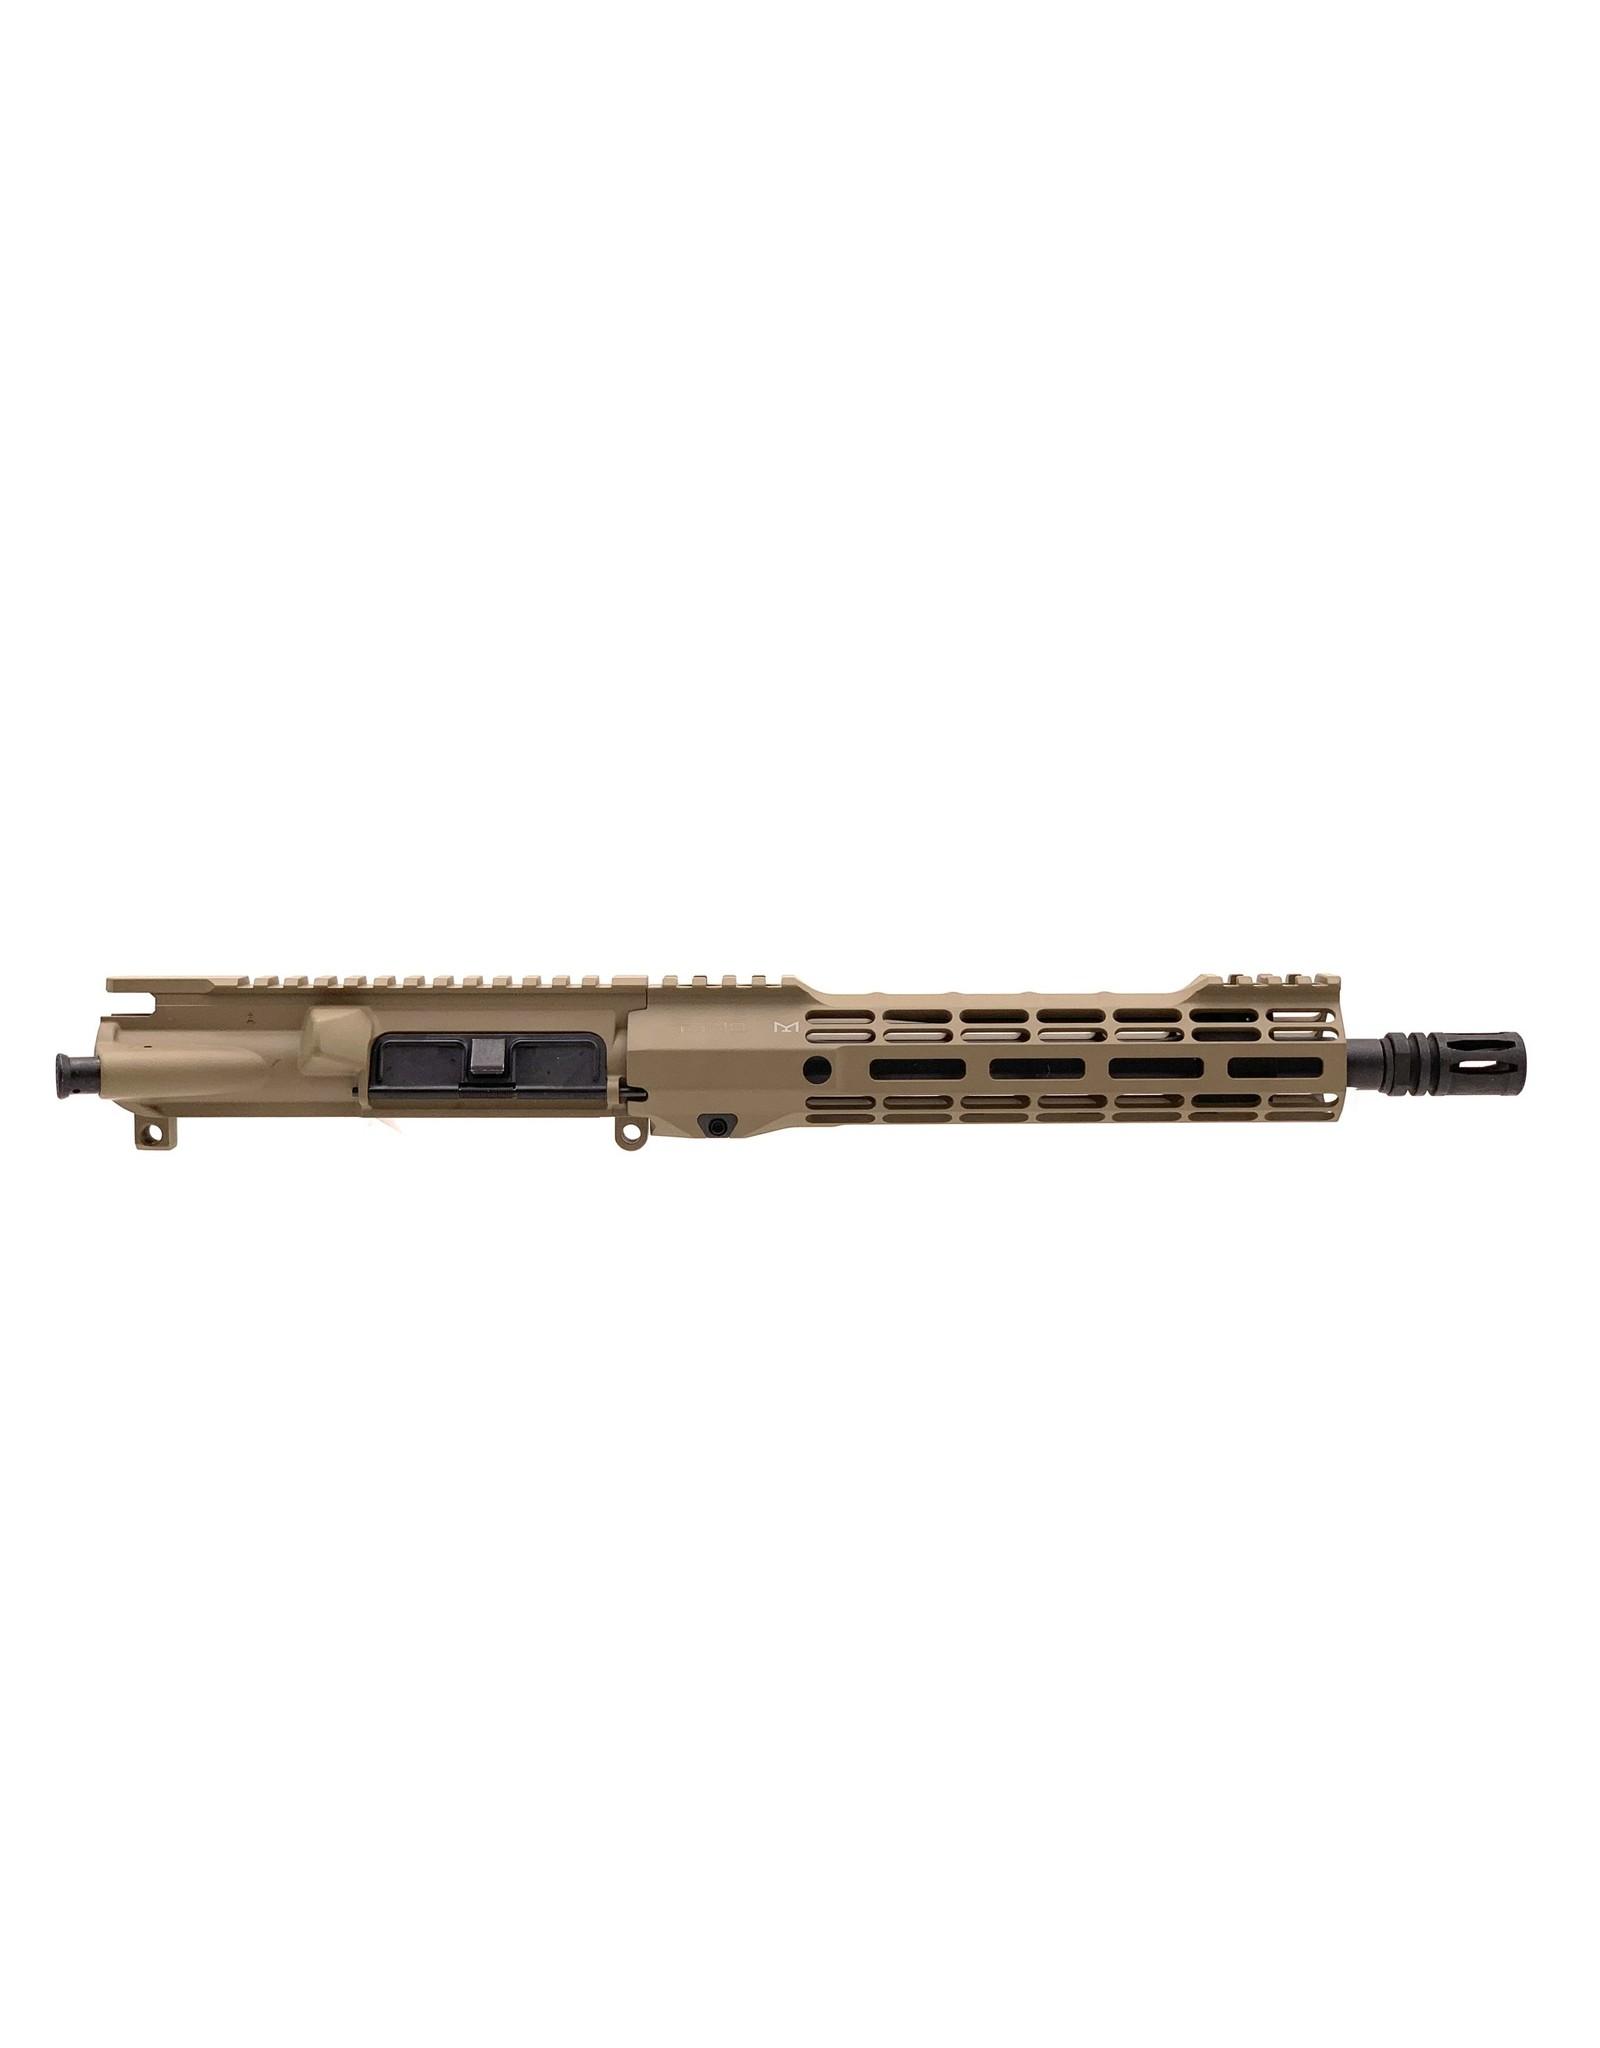 "Sam Diego Tactical 10.5"" 5.56 NATO Complete Upper, S-One HG - FDE Cerakote"